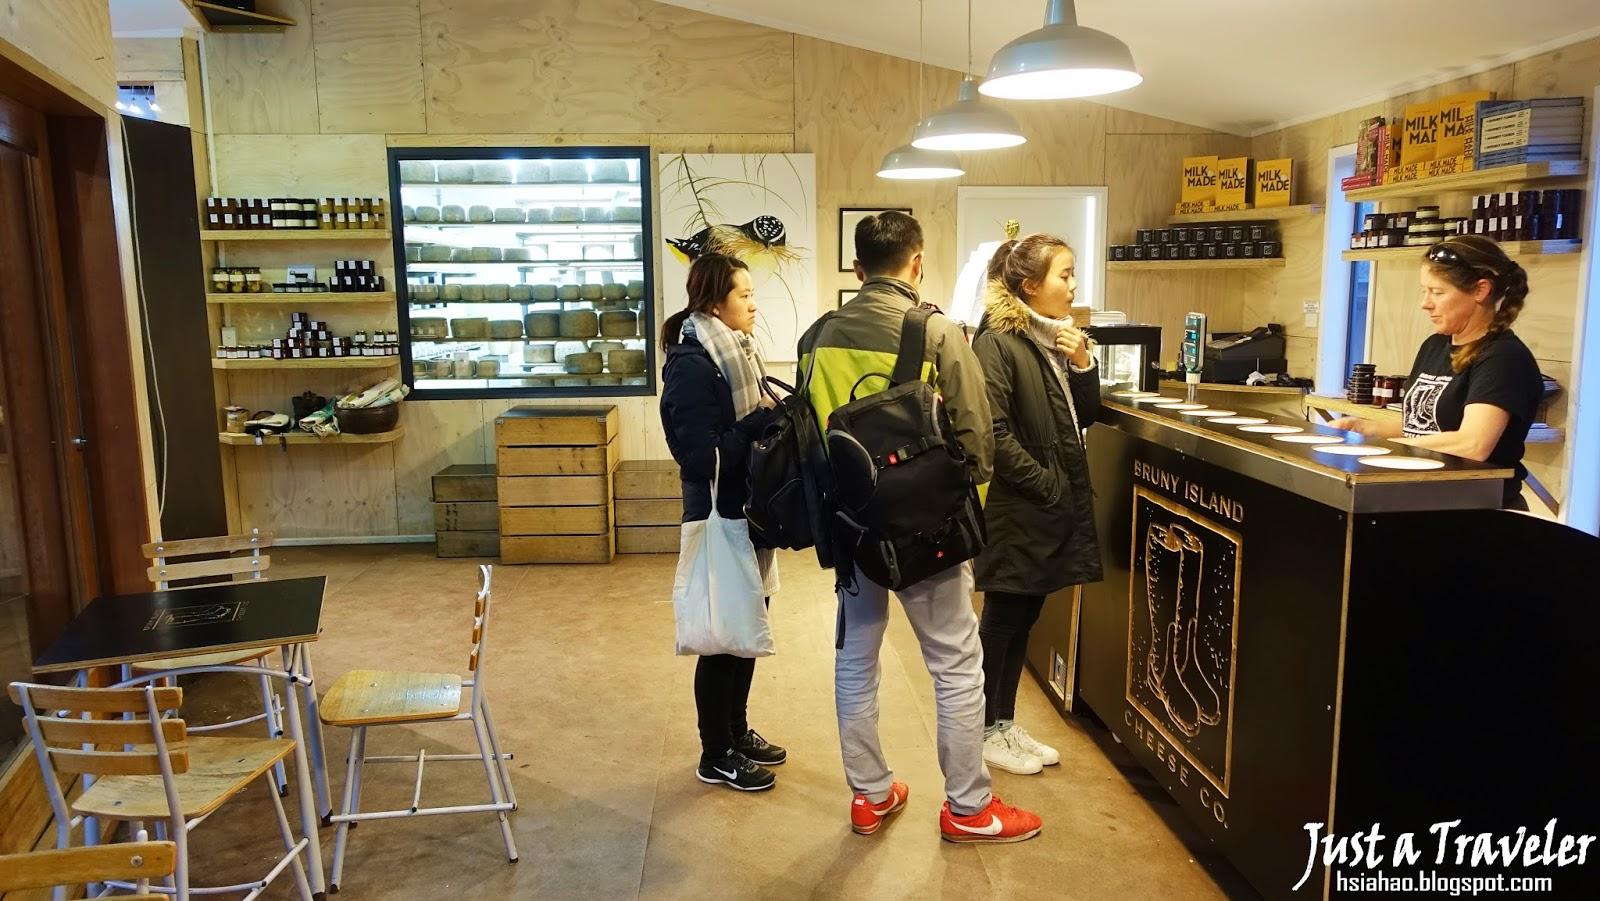 塔斯馬尼亞-景點-推薦-布魯尼島-Bruny-Island-起司工廠-Cheese-Company-澳洲-Tasmania-Tourist-Attraction-Australia